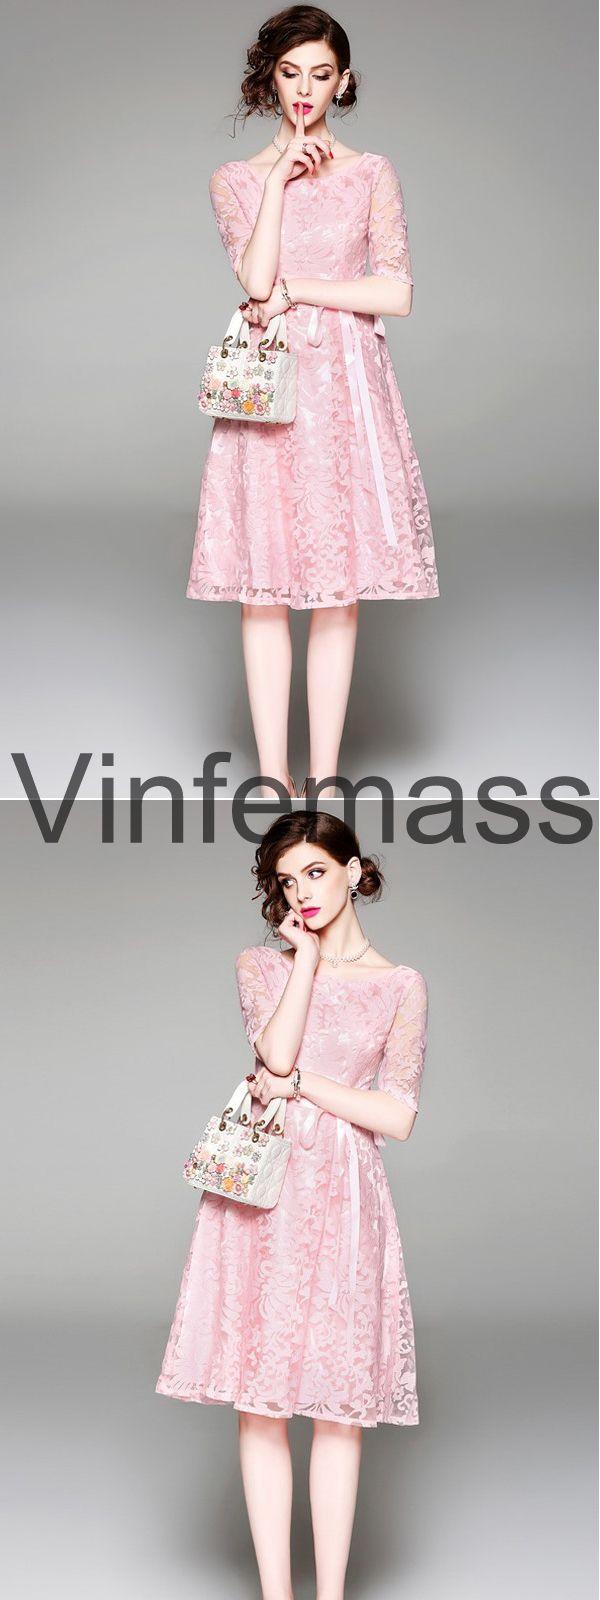 2 piece white lace dress may 2019 Pink Lace Party Dresslovely style vinfemass pinkdress lacedress